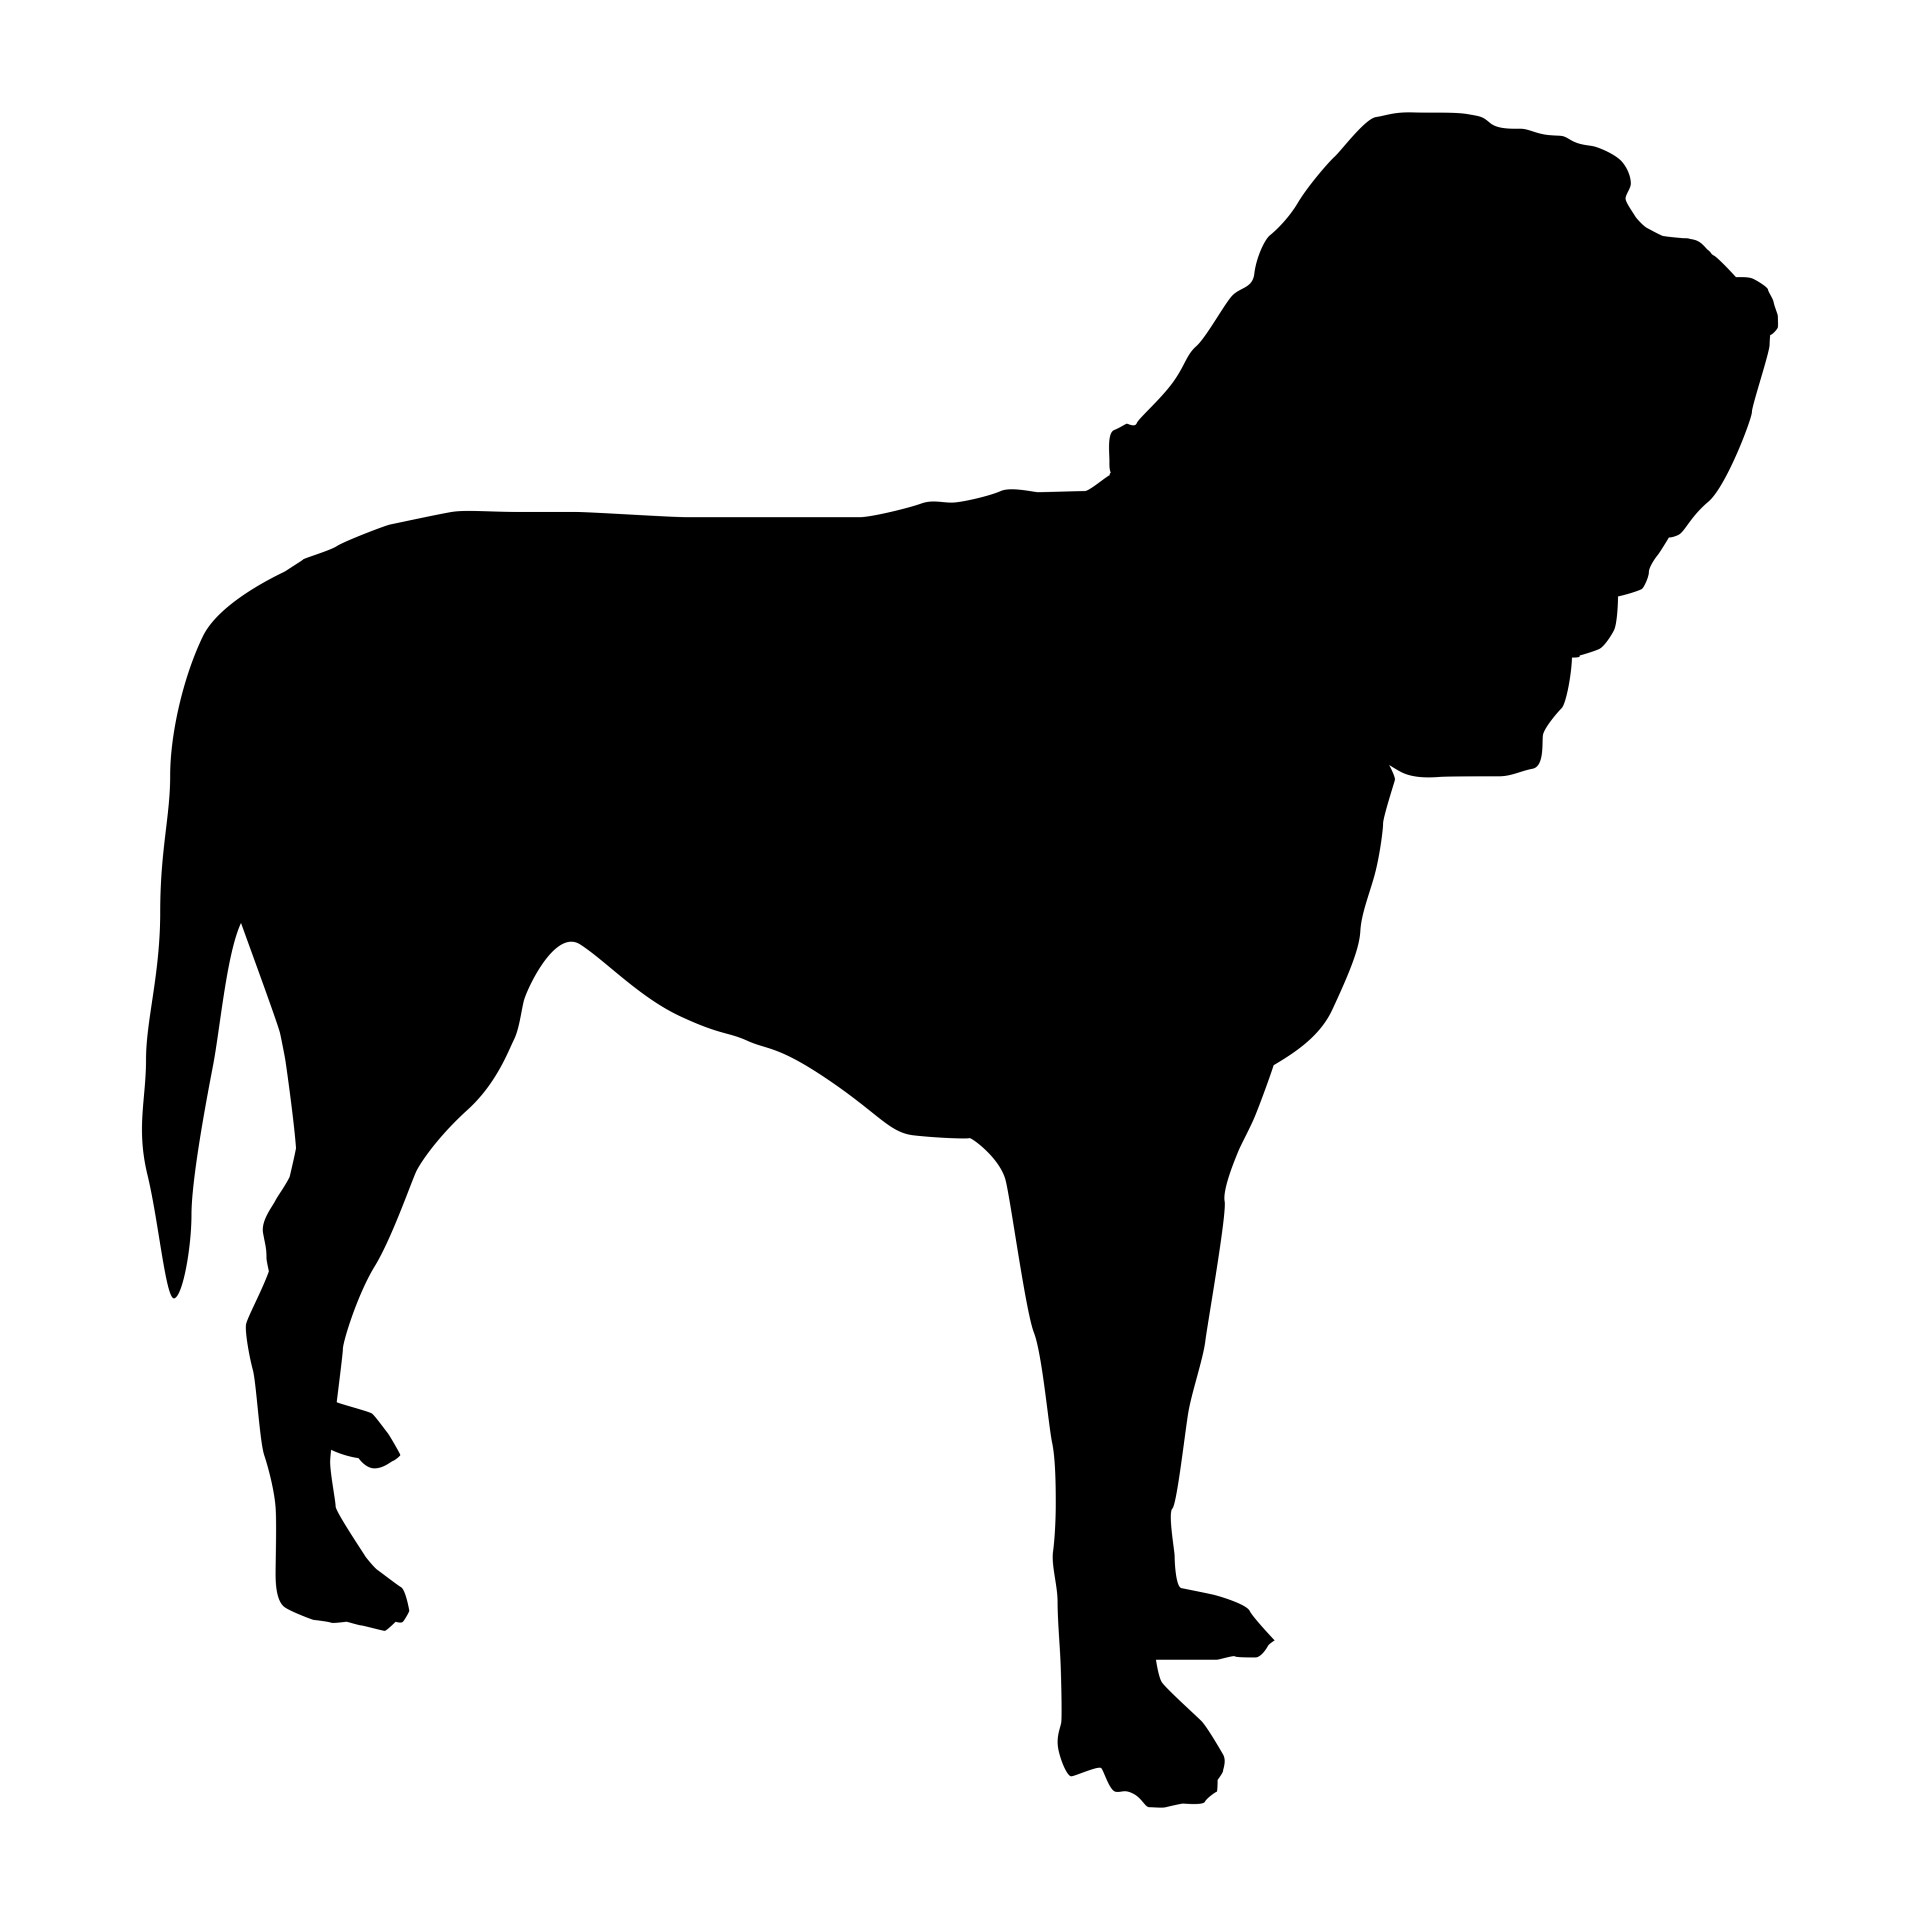 1920x1920 Bloodhound Silhouette Free Stock Photo